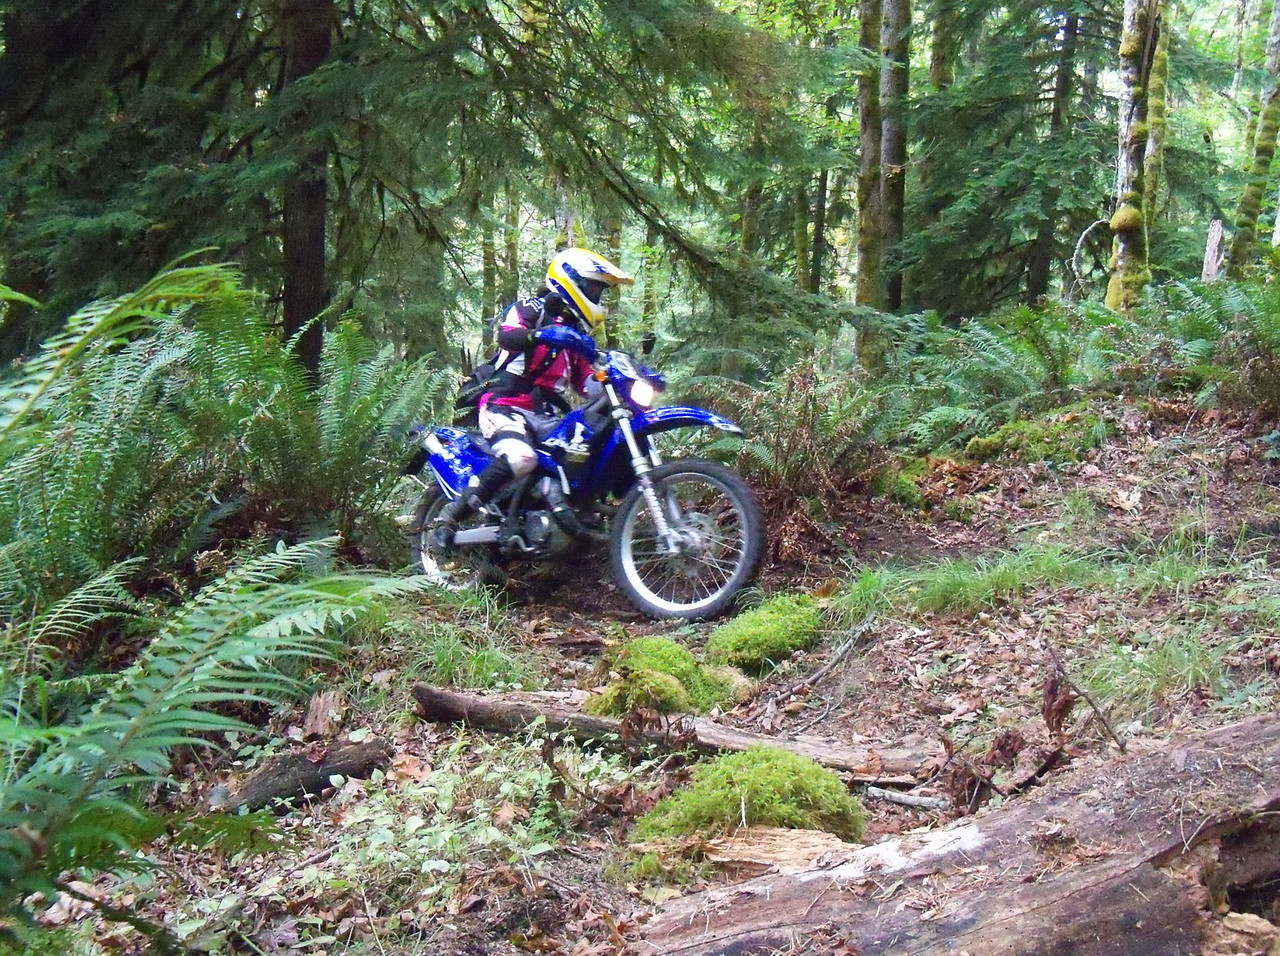 Krause Ridge is Joe's favorite trail